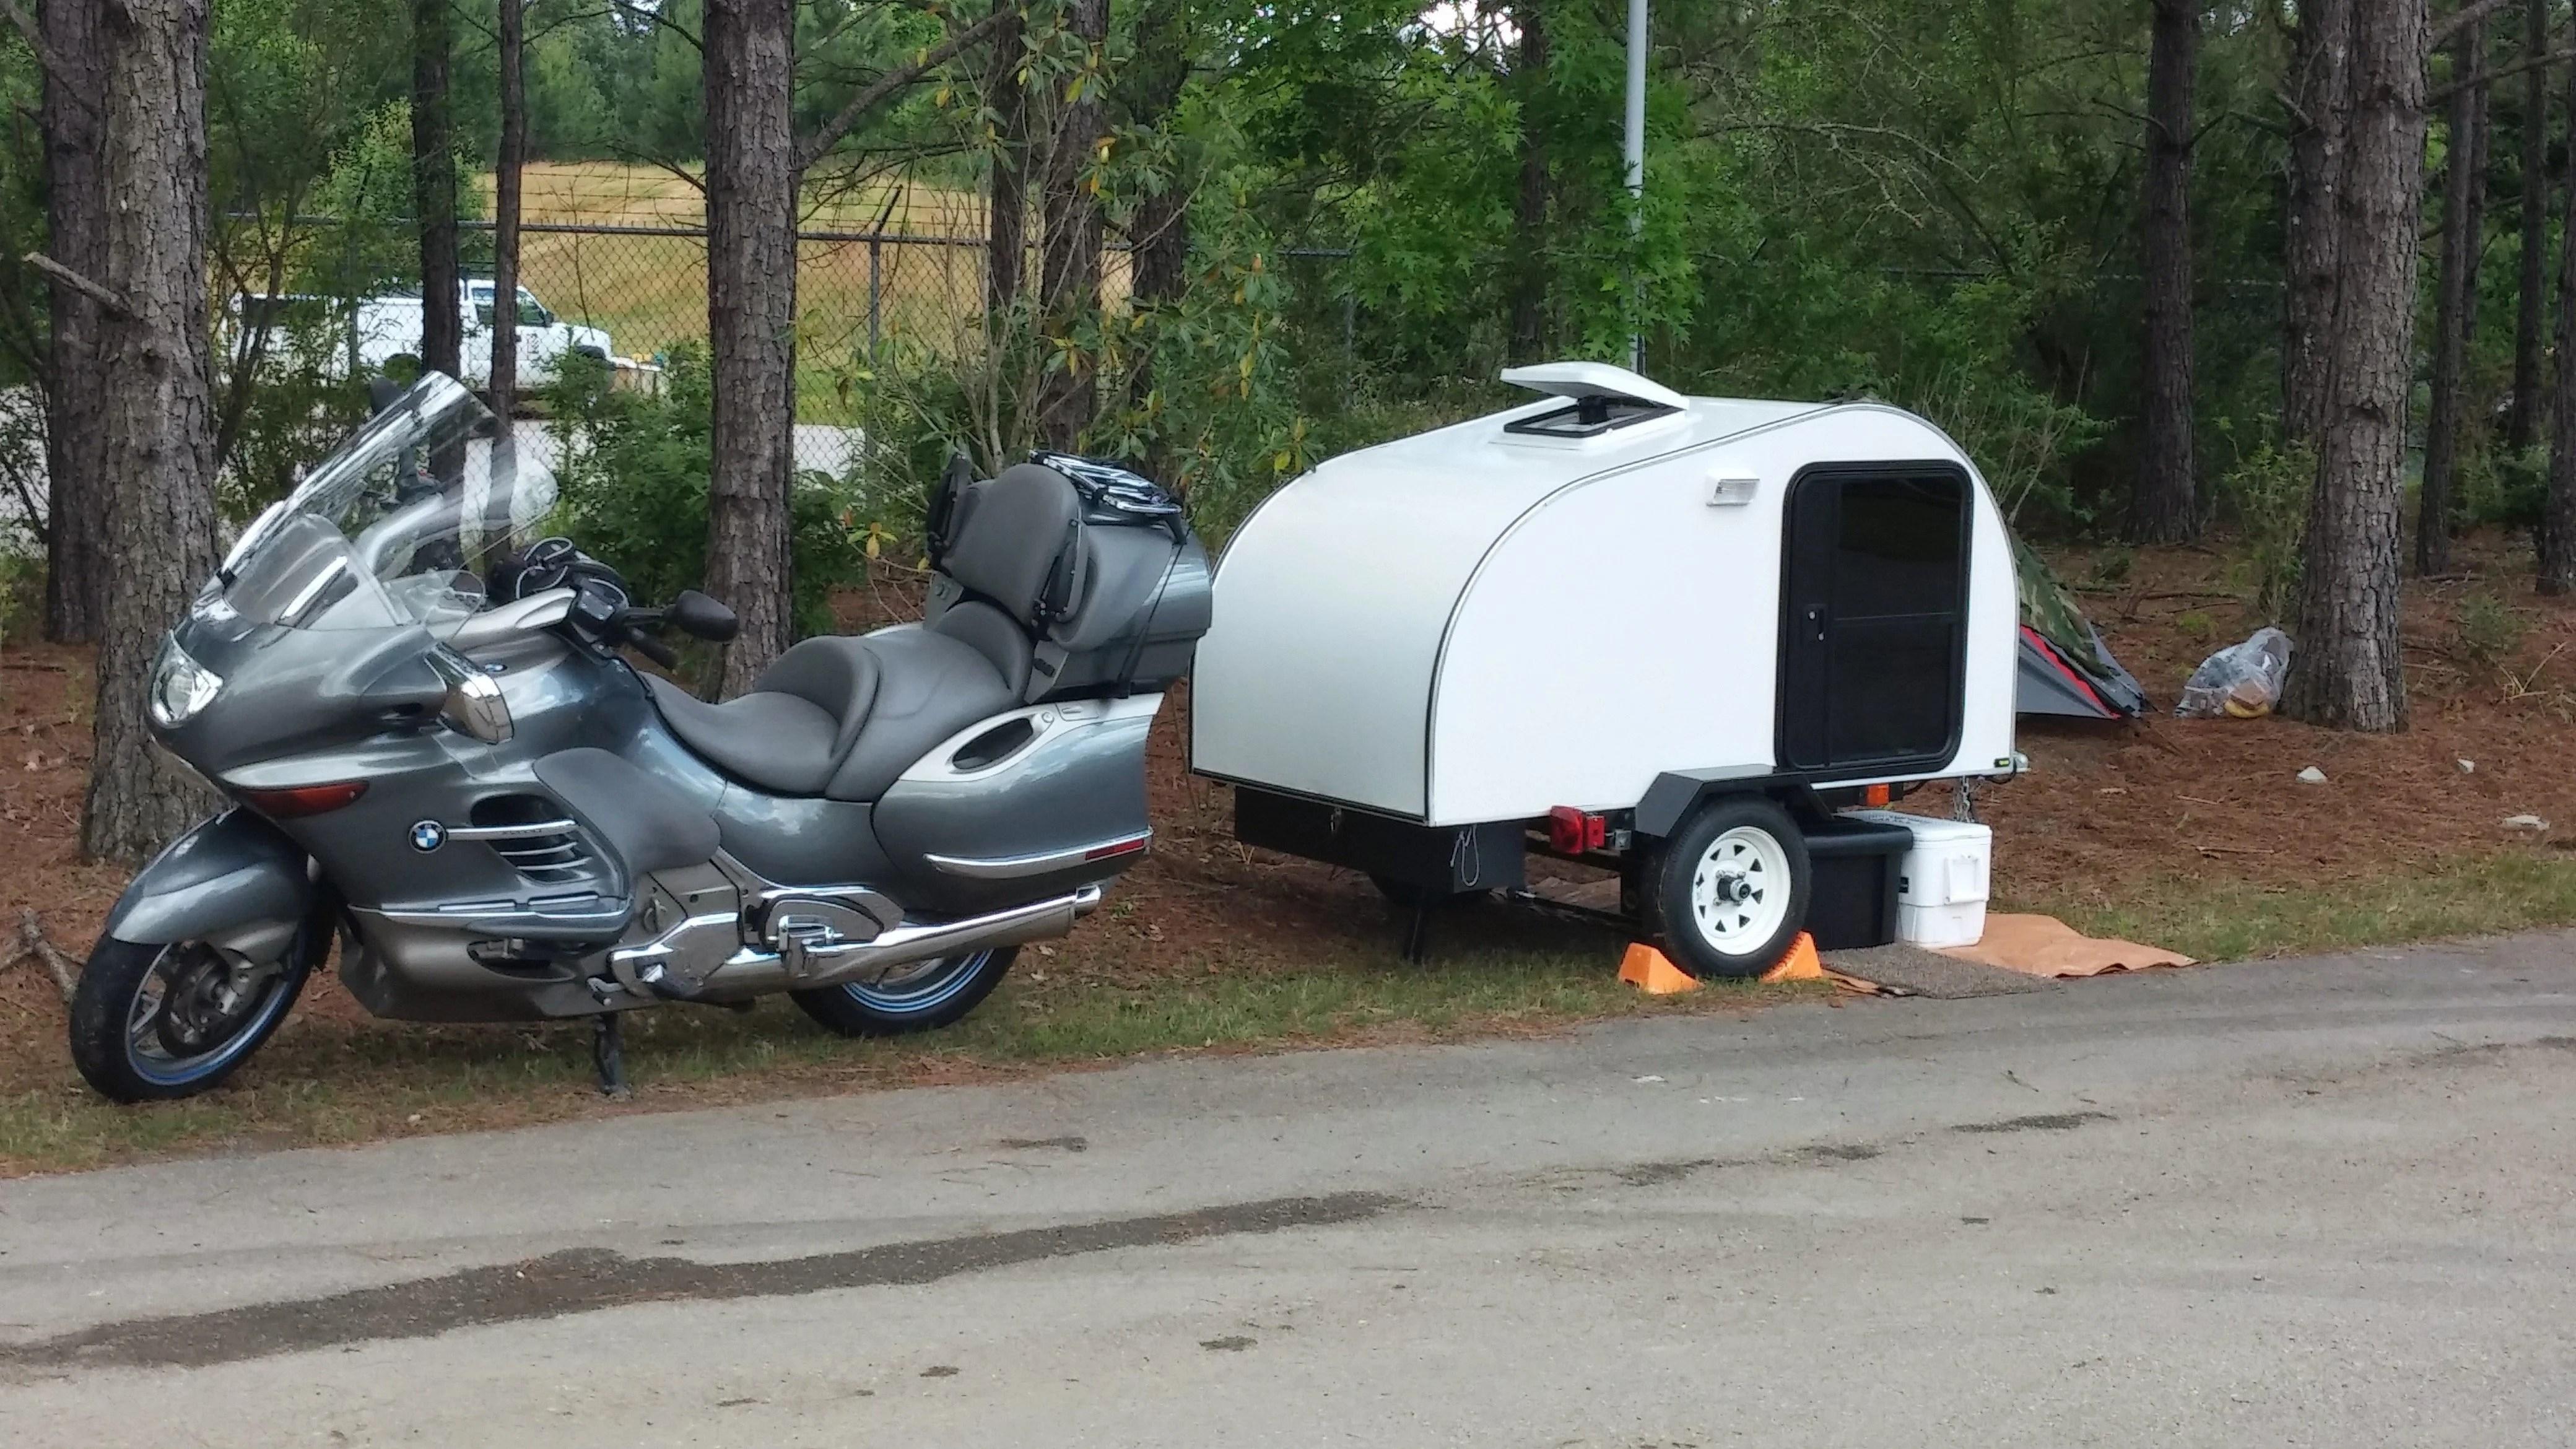 motorcycle camper trailer plans